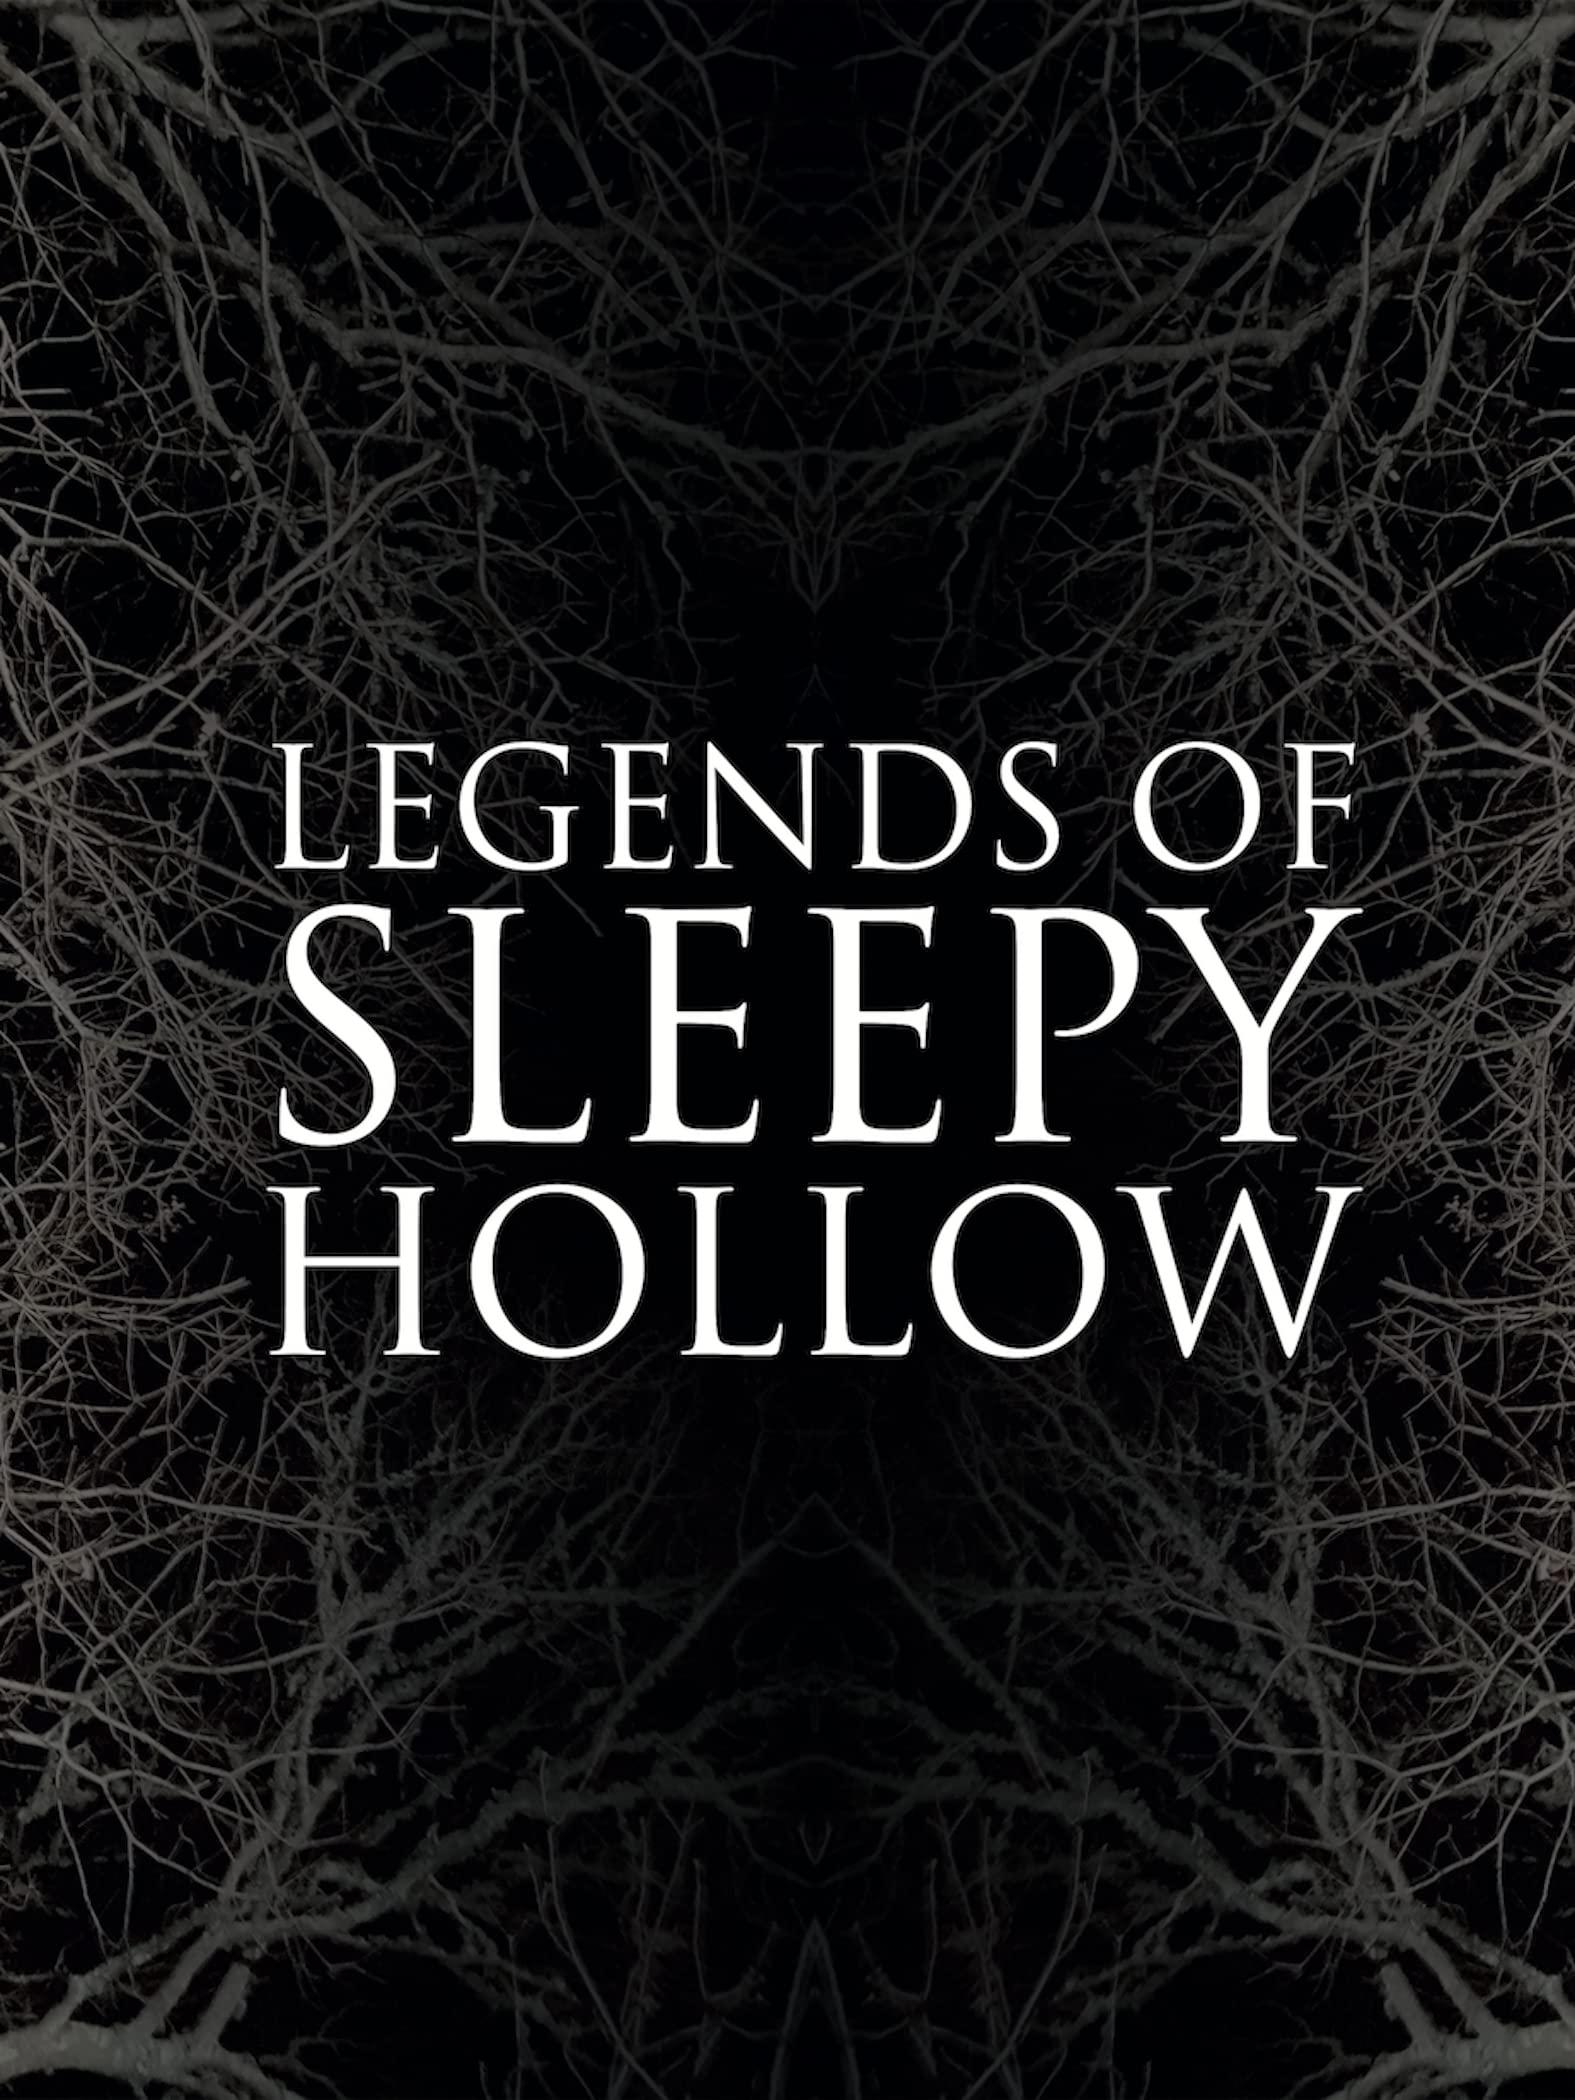 Legends of Sleepy Hollow on Amazon Prime Video UK